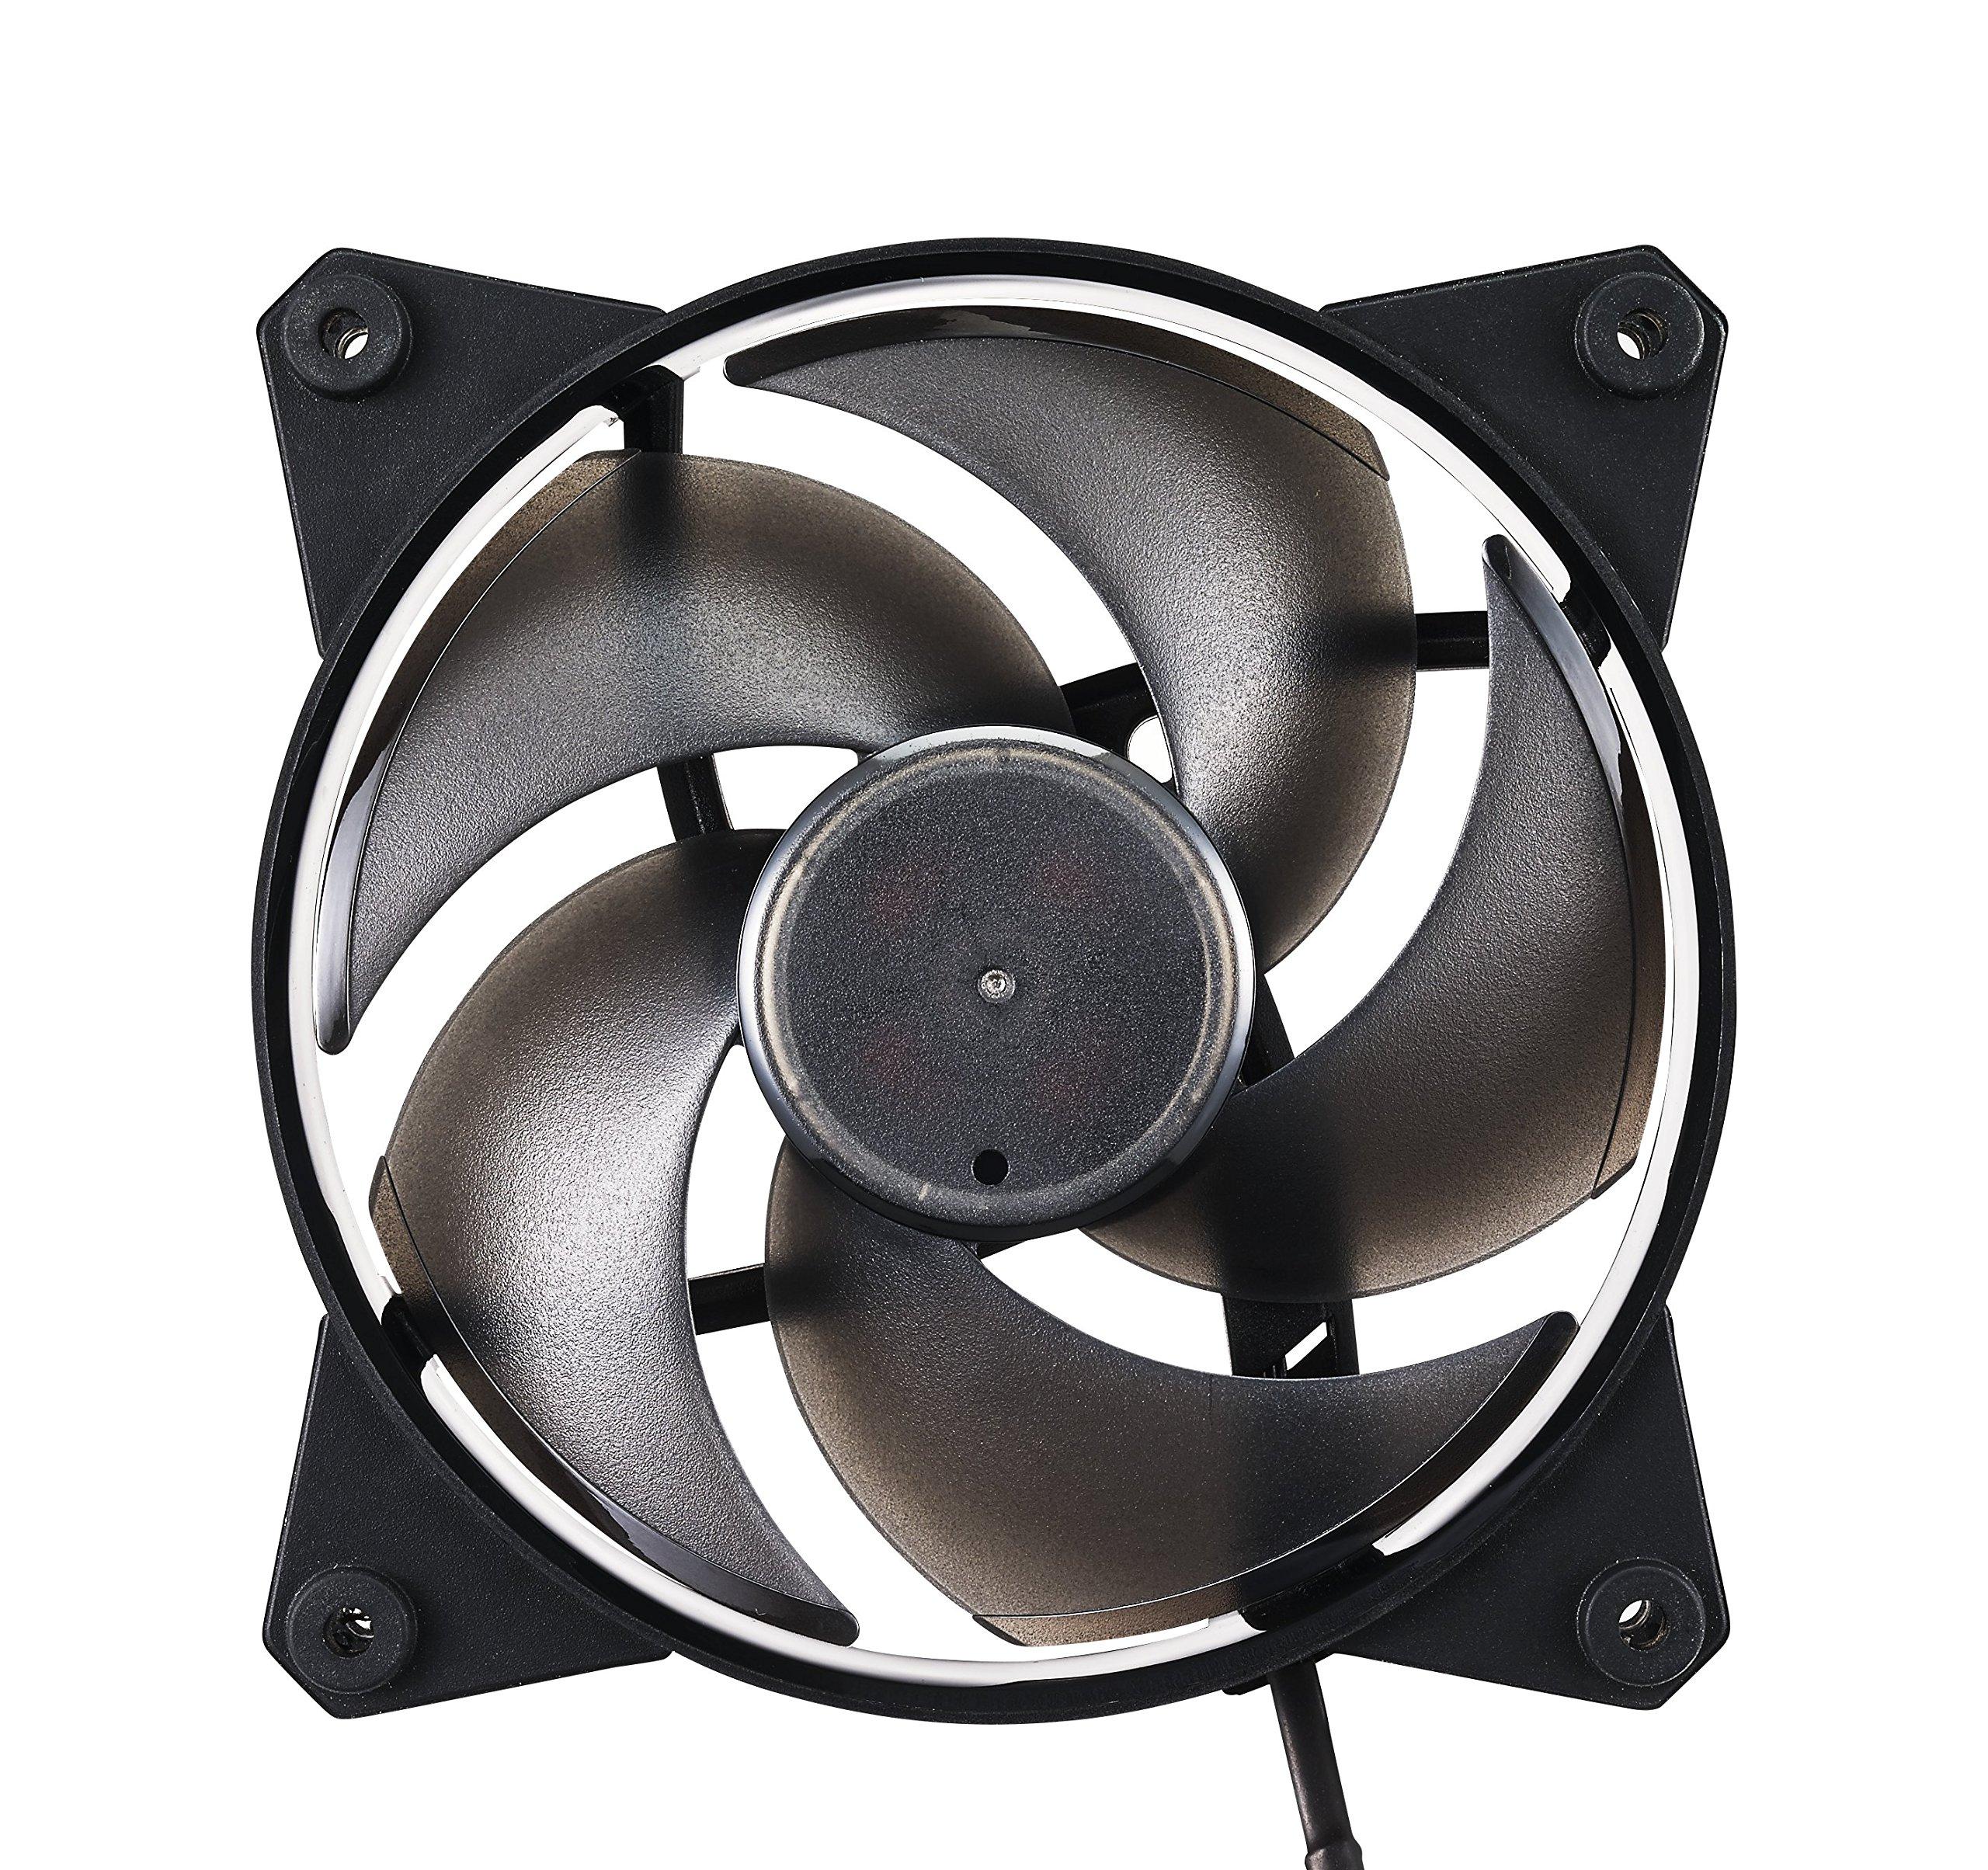 Cooler Master MasterFan Pro 120 Air Pressure- 120mm Static Pressure Black Case Fan, Computer Cases CPU Coolers and Radiators